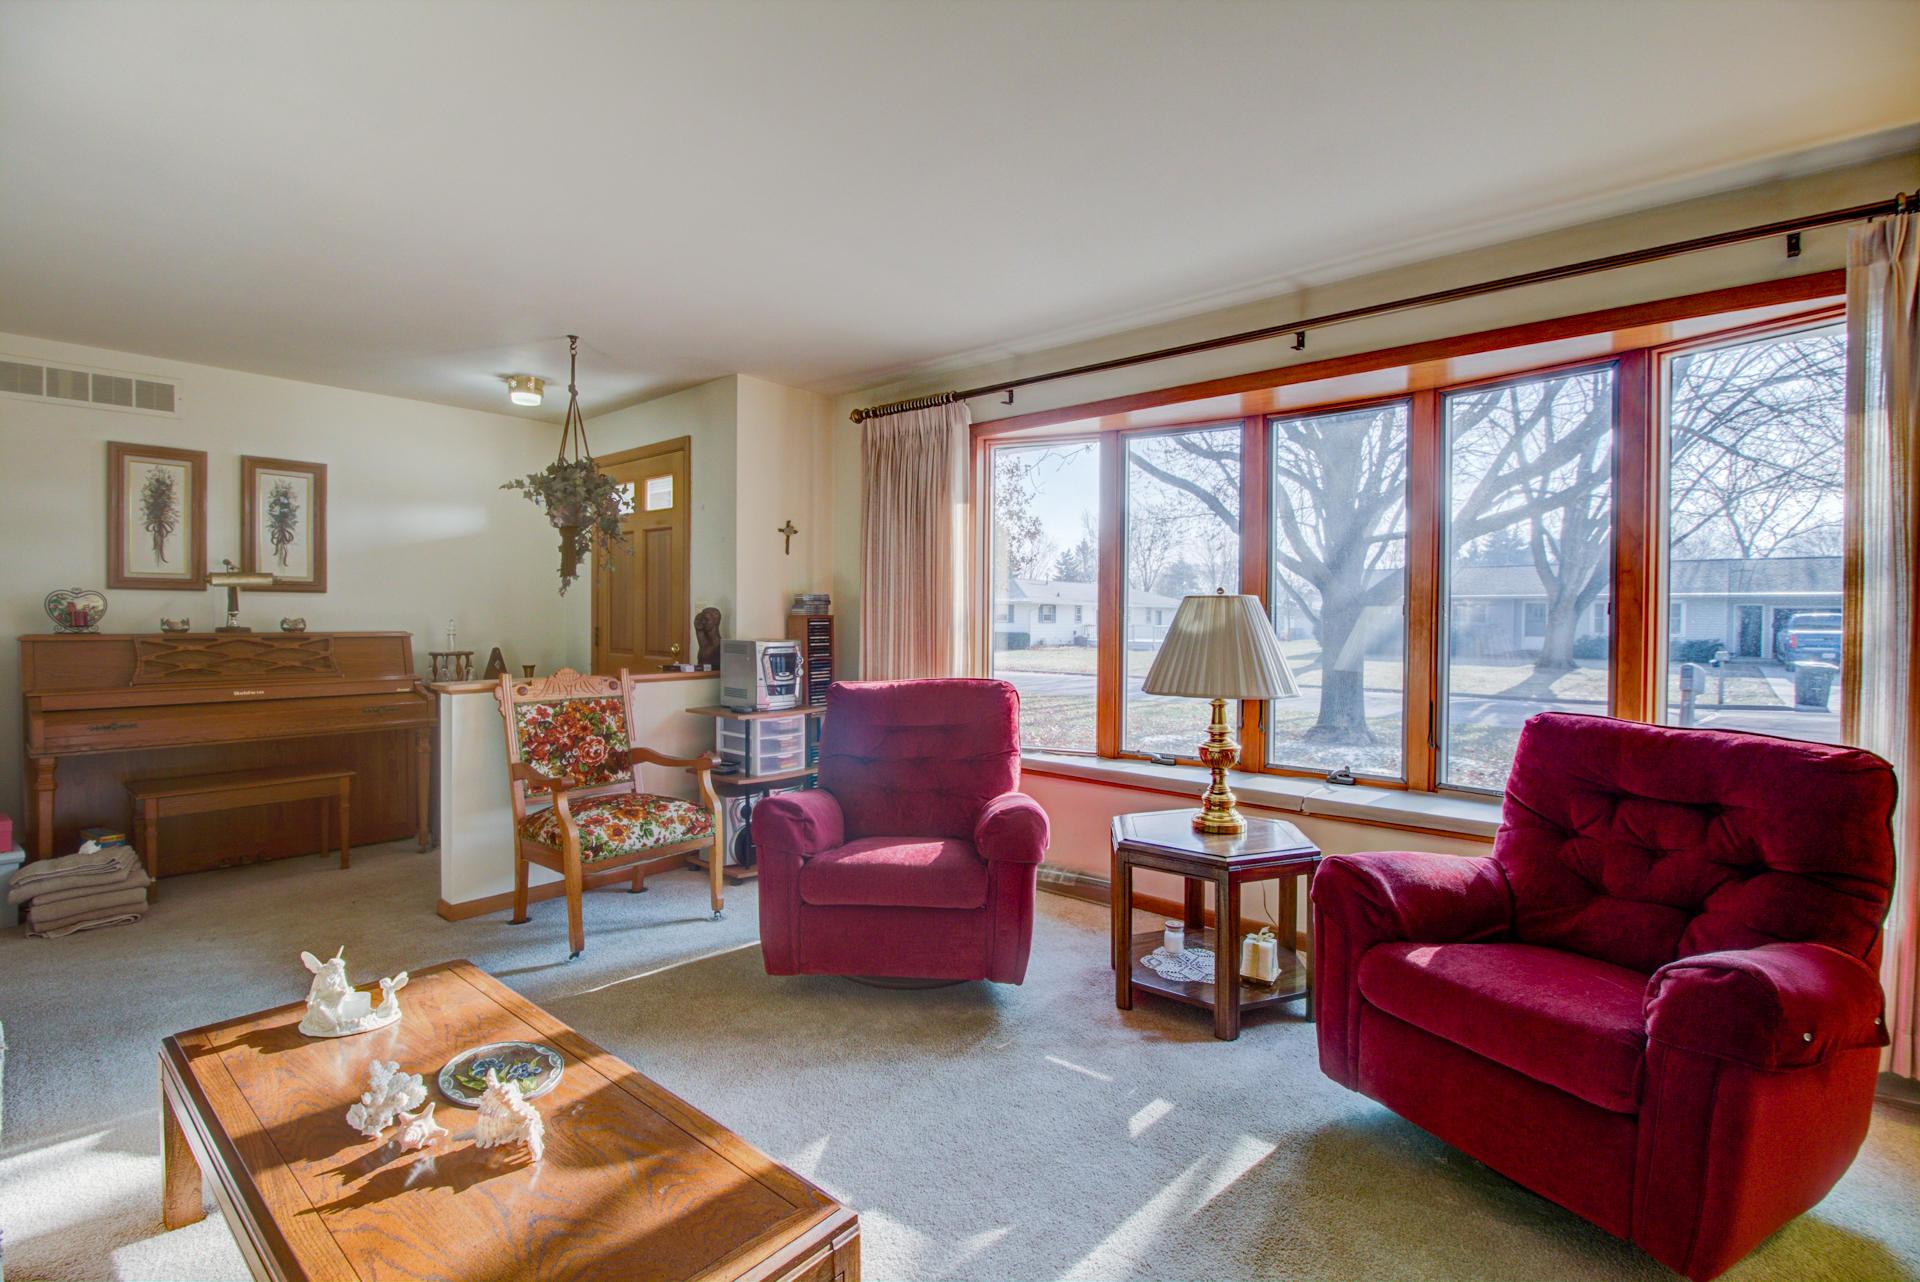 676 Daffodil Ct, Oconomowoc, Wisconsin 53066, 3 Bedrooms Bedrooms, 7 Rooms Rooms,1 BathroomBathrooms,Single-Family,For Sale,Daffodil Ct,1616826